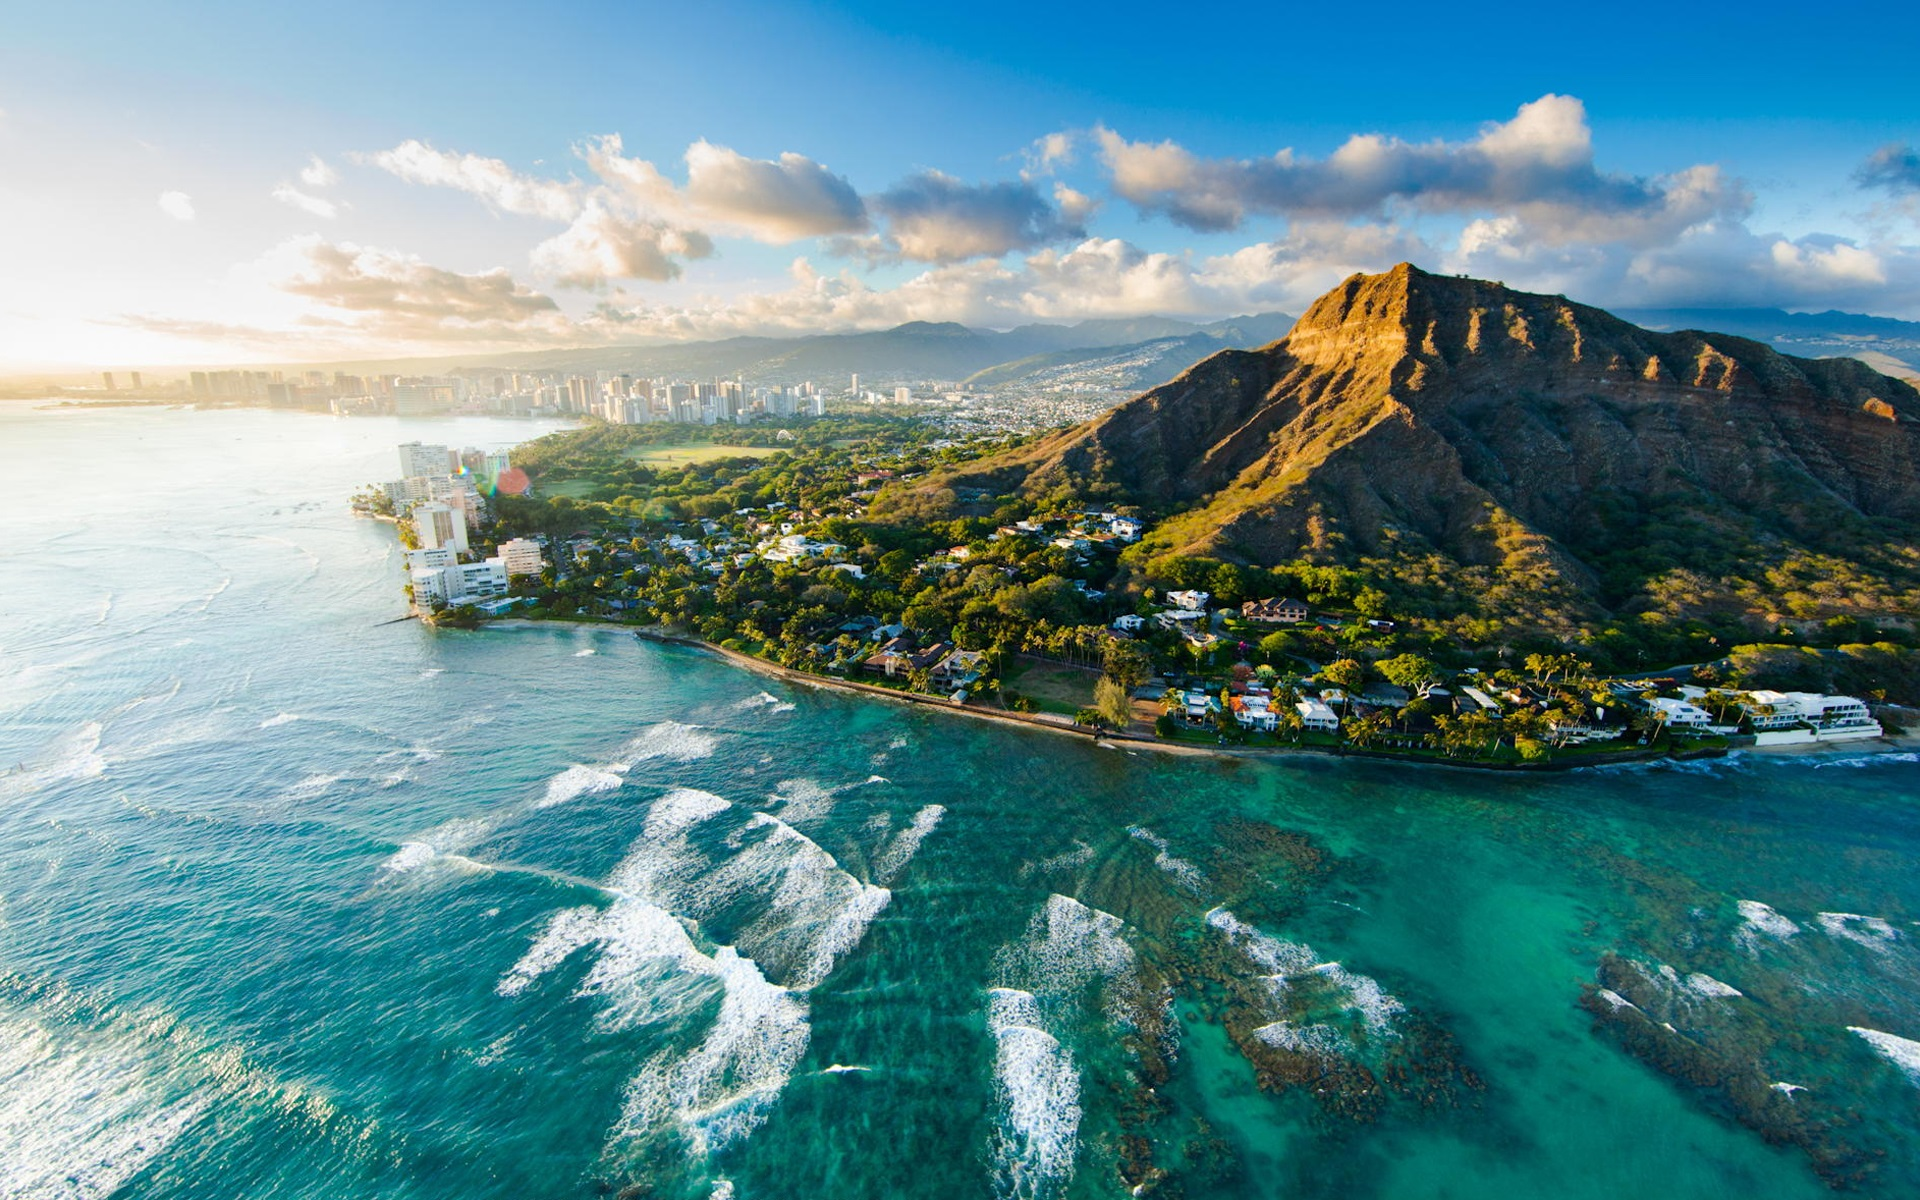 Anime Sunset Wallpaper Diamond Head At Sunset Hawaii Usa Beautiful City Sea